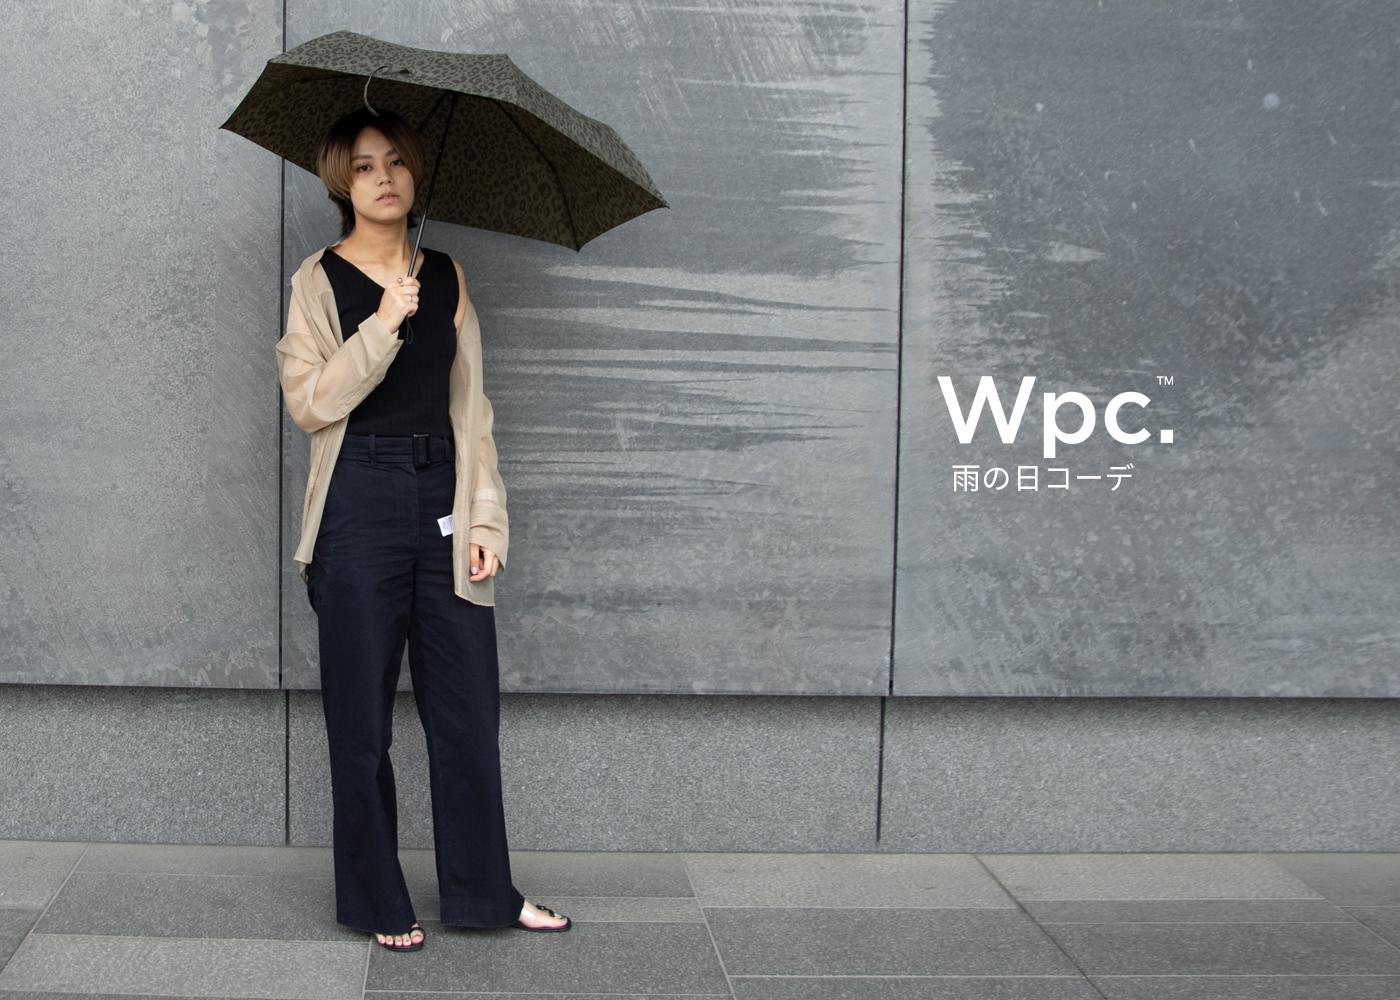 Wpc.傘を使った雨の日コーデ